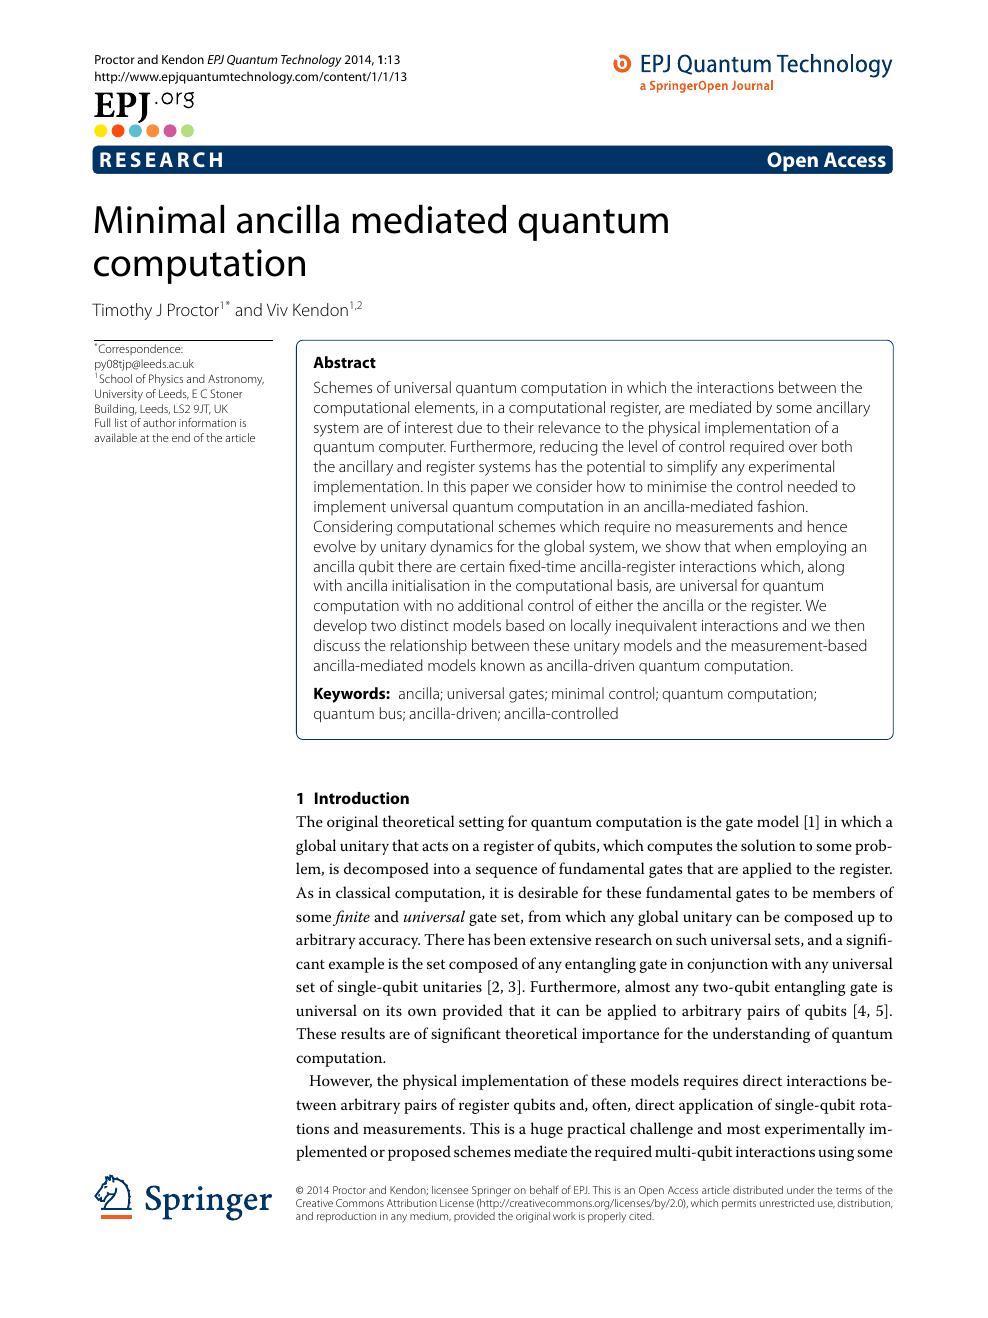 Minimal ancilla mediated quantum computation – topic of